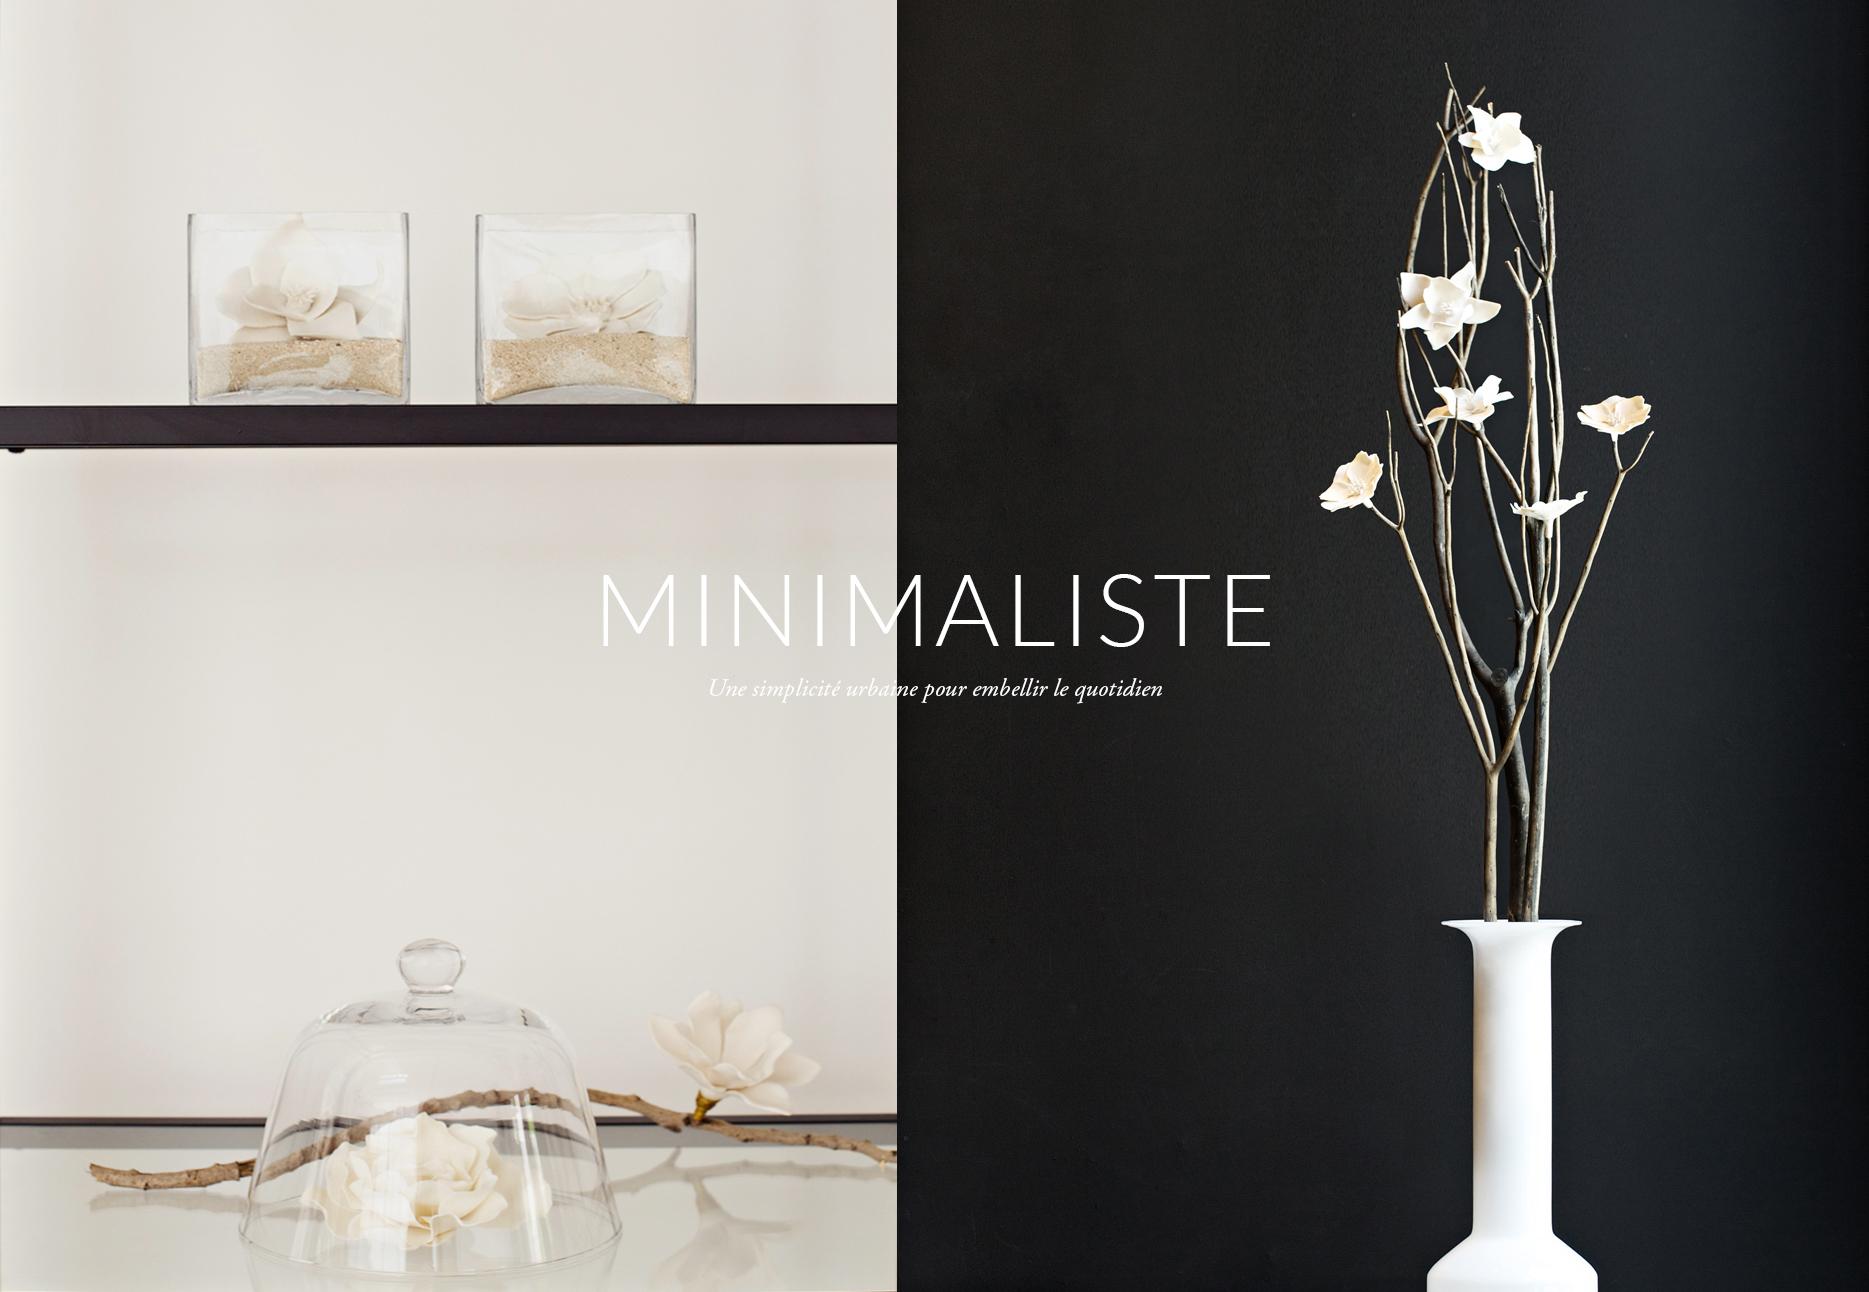 Minimaliste_1869x1292_Texte.jpg